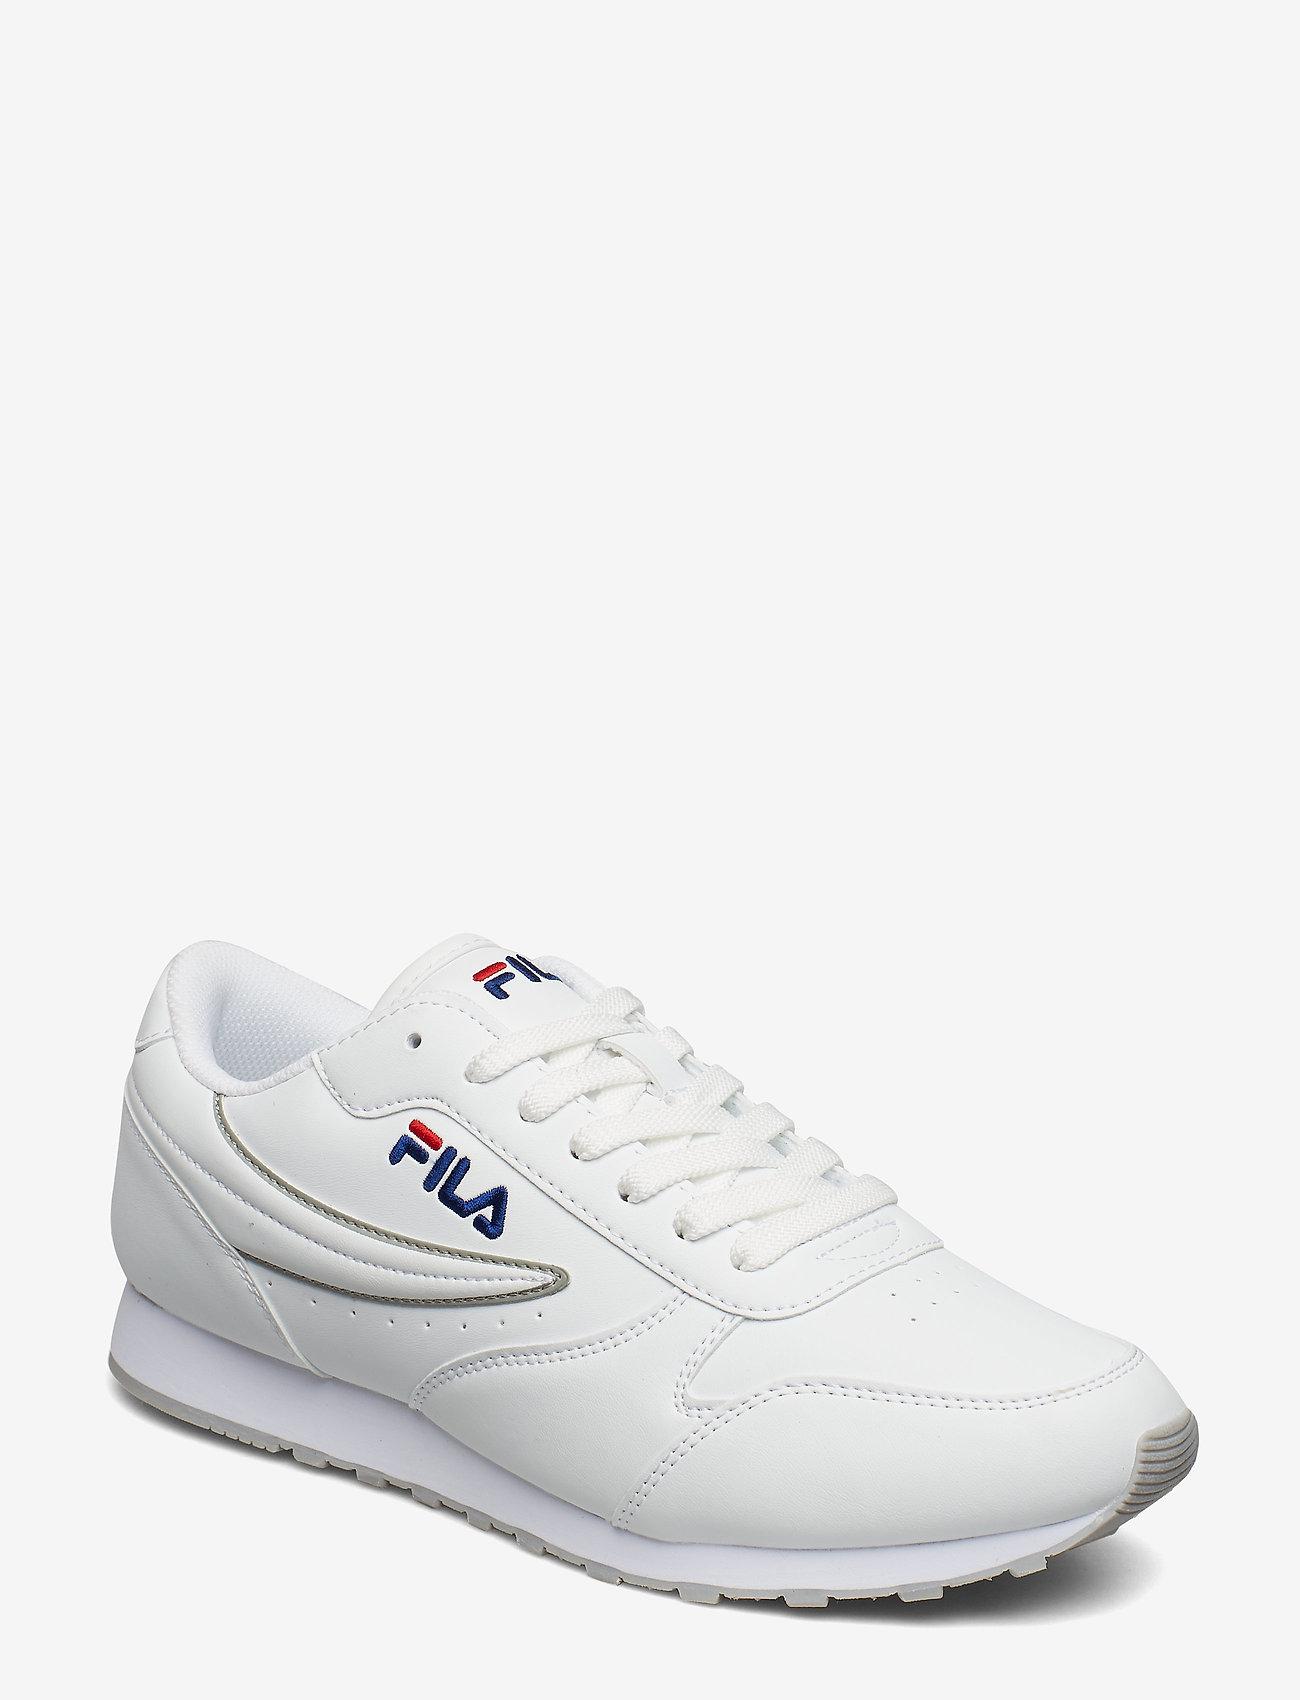 FILA - Orbit low - baskets basses - white - 0